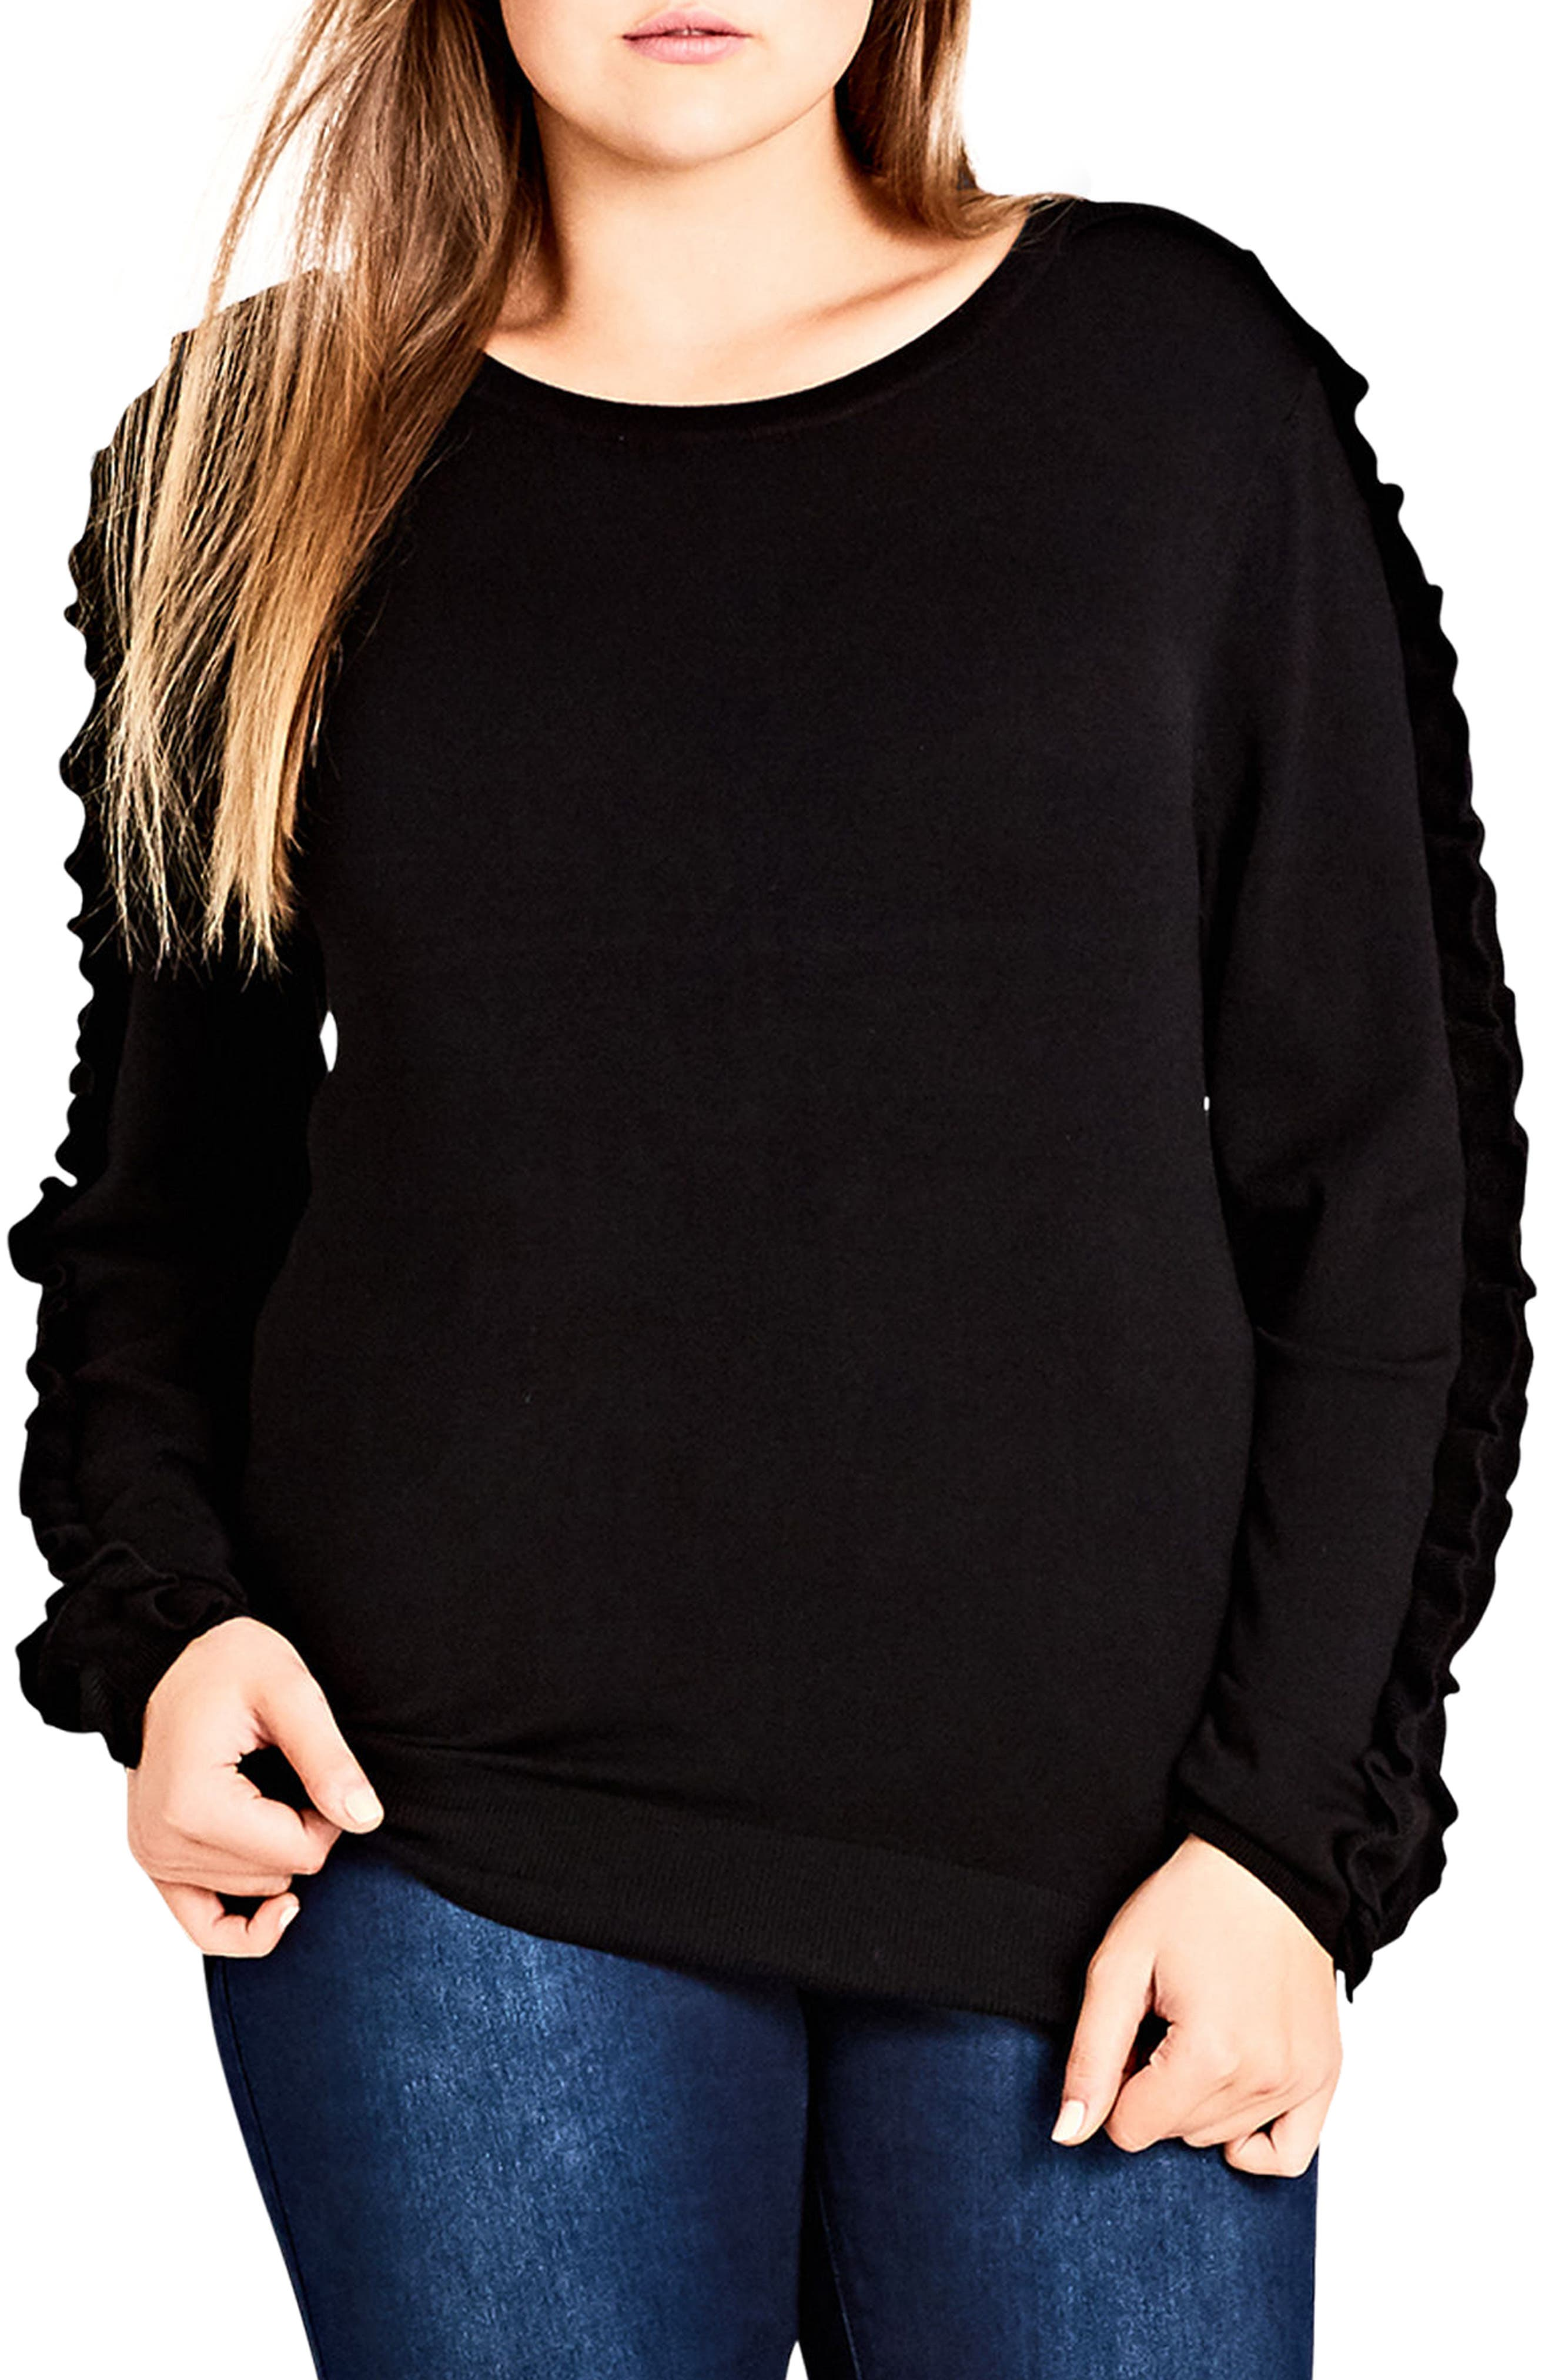 Charmed Ruffle Sleeve Sweater,                             Main thumbnail 1, color,                             BLACK